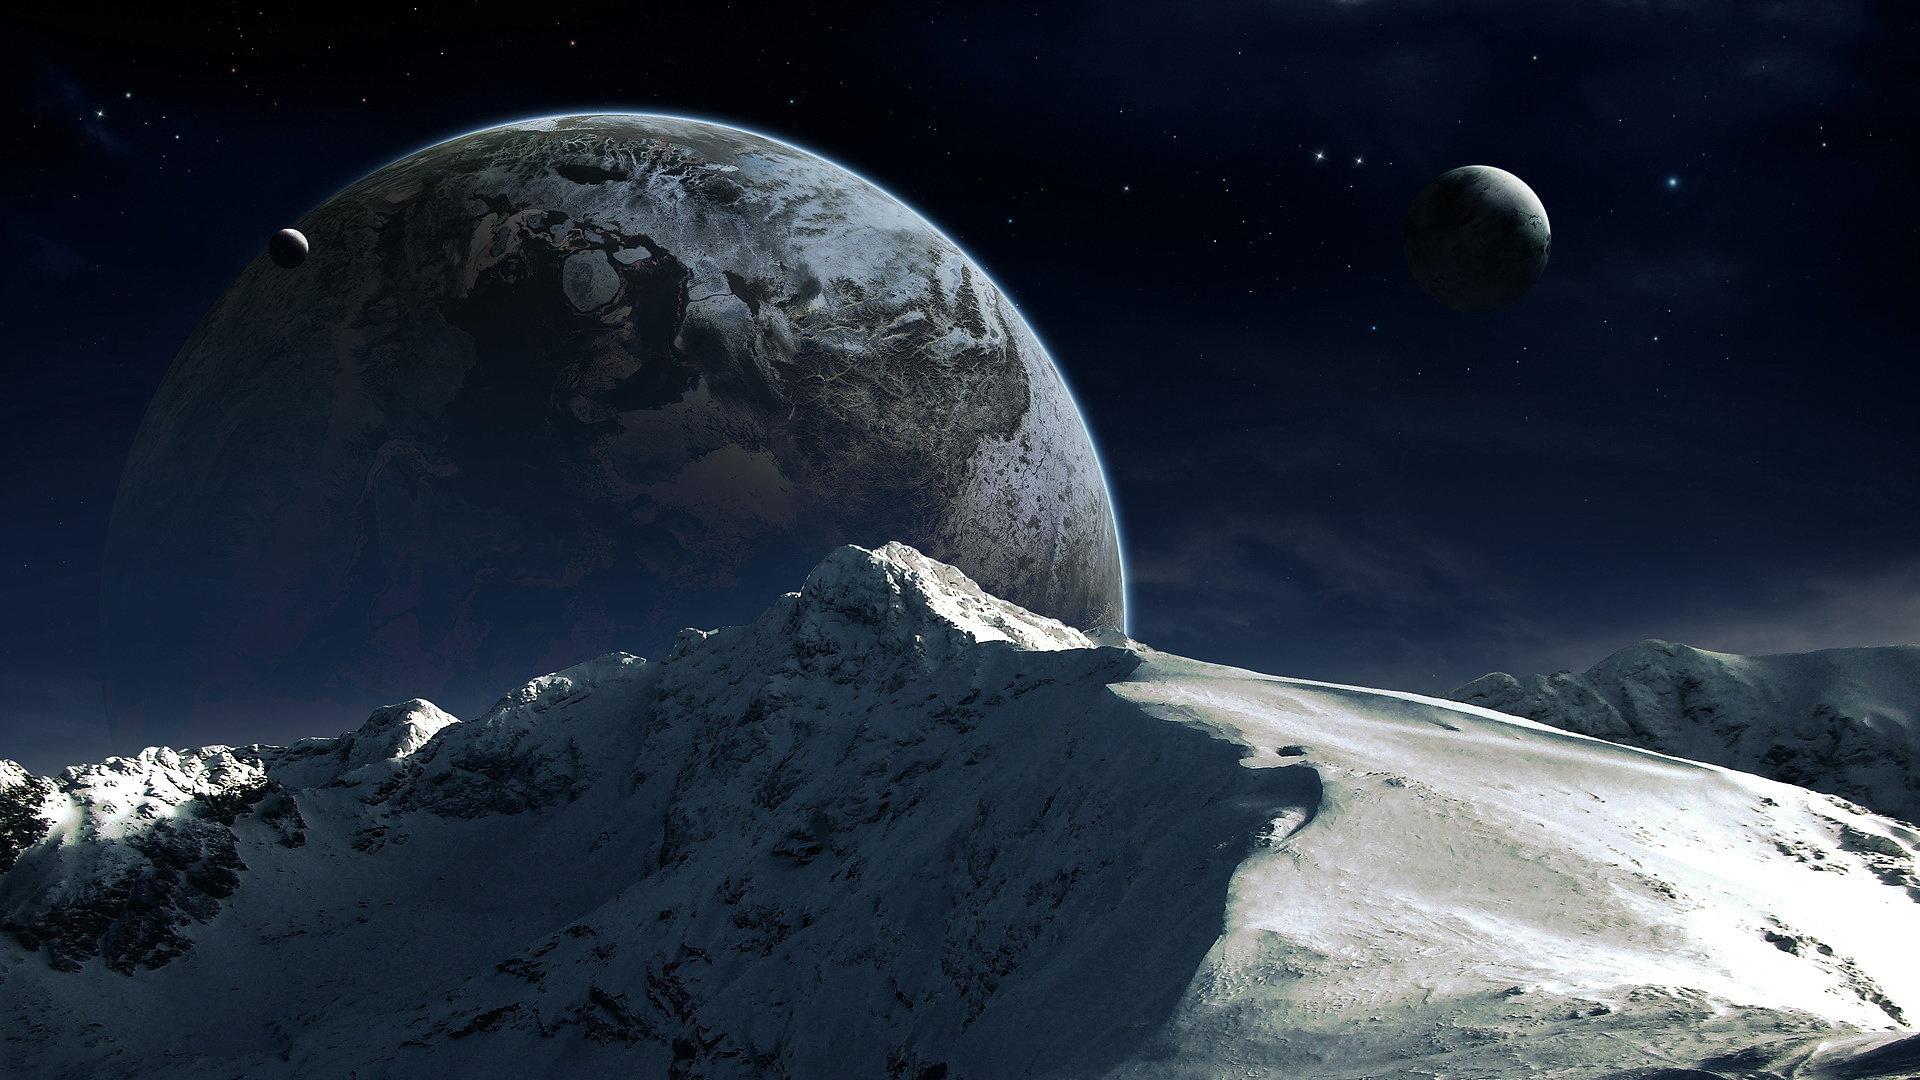 High Resolution Sci Fi Landscape Hd 1080p Wallpaper ID233050 For Desktop